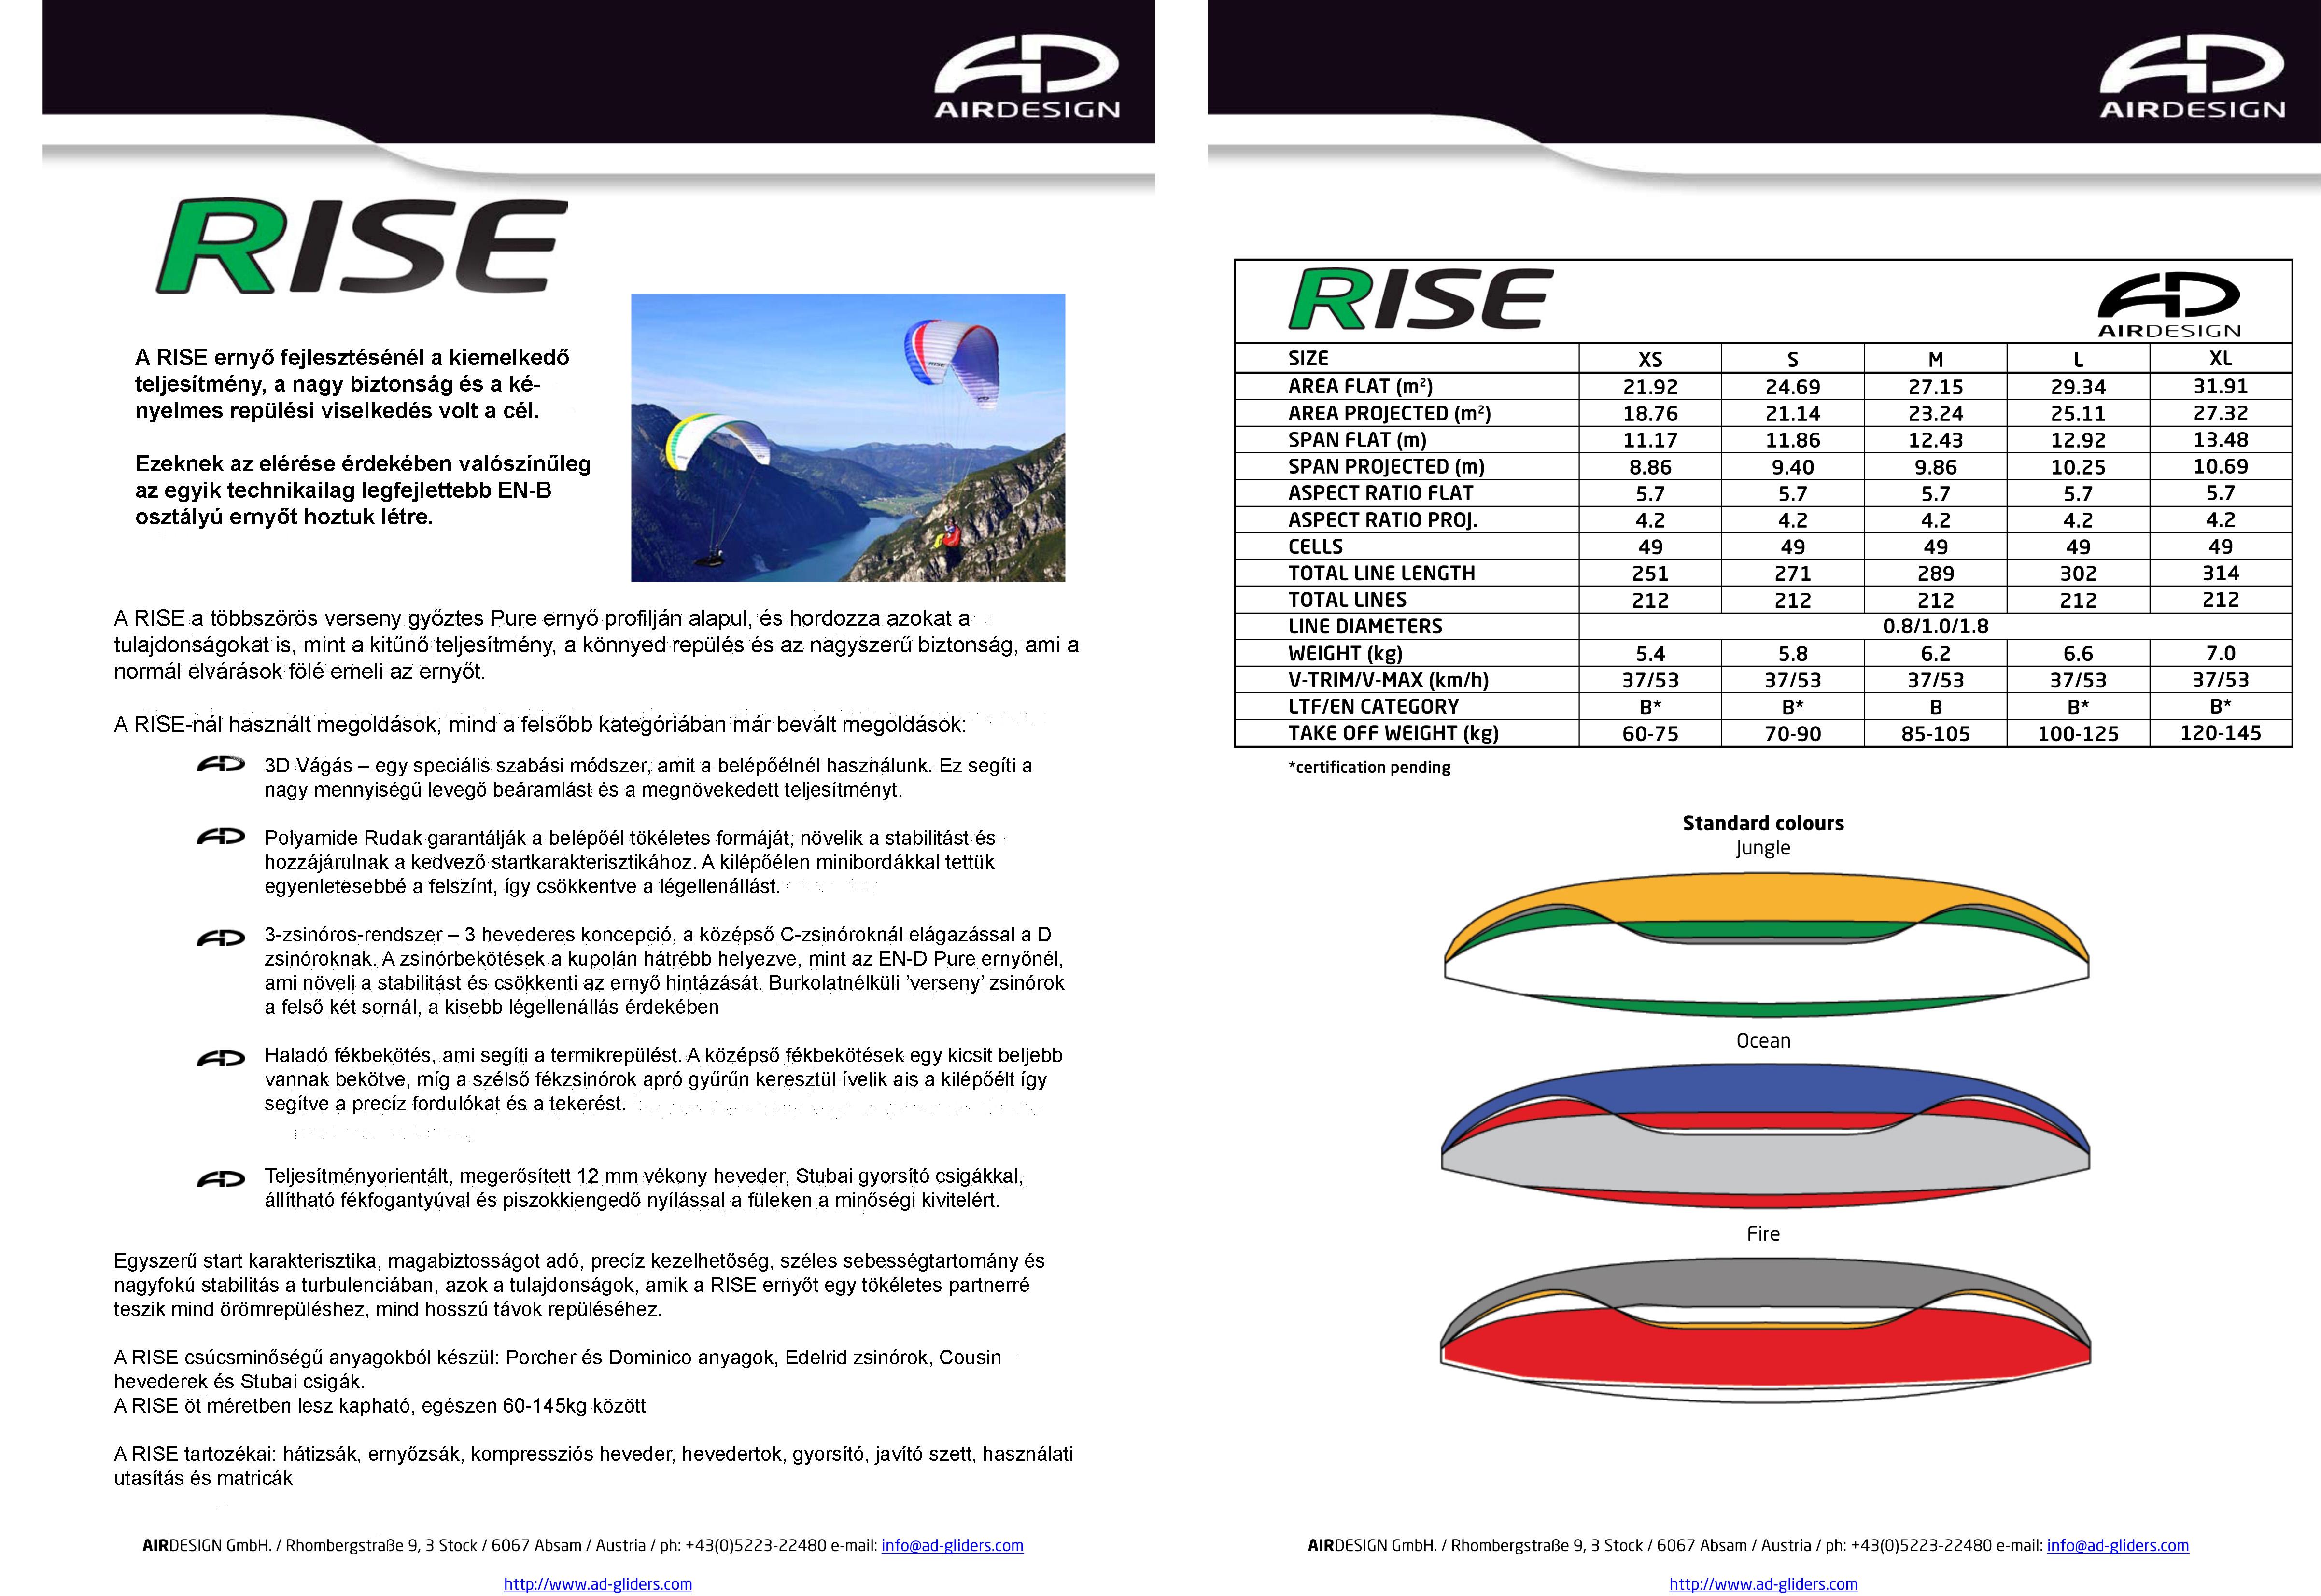 Air Design RISE